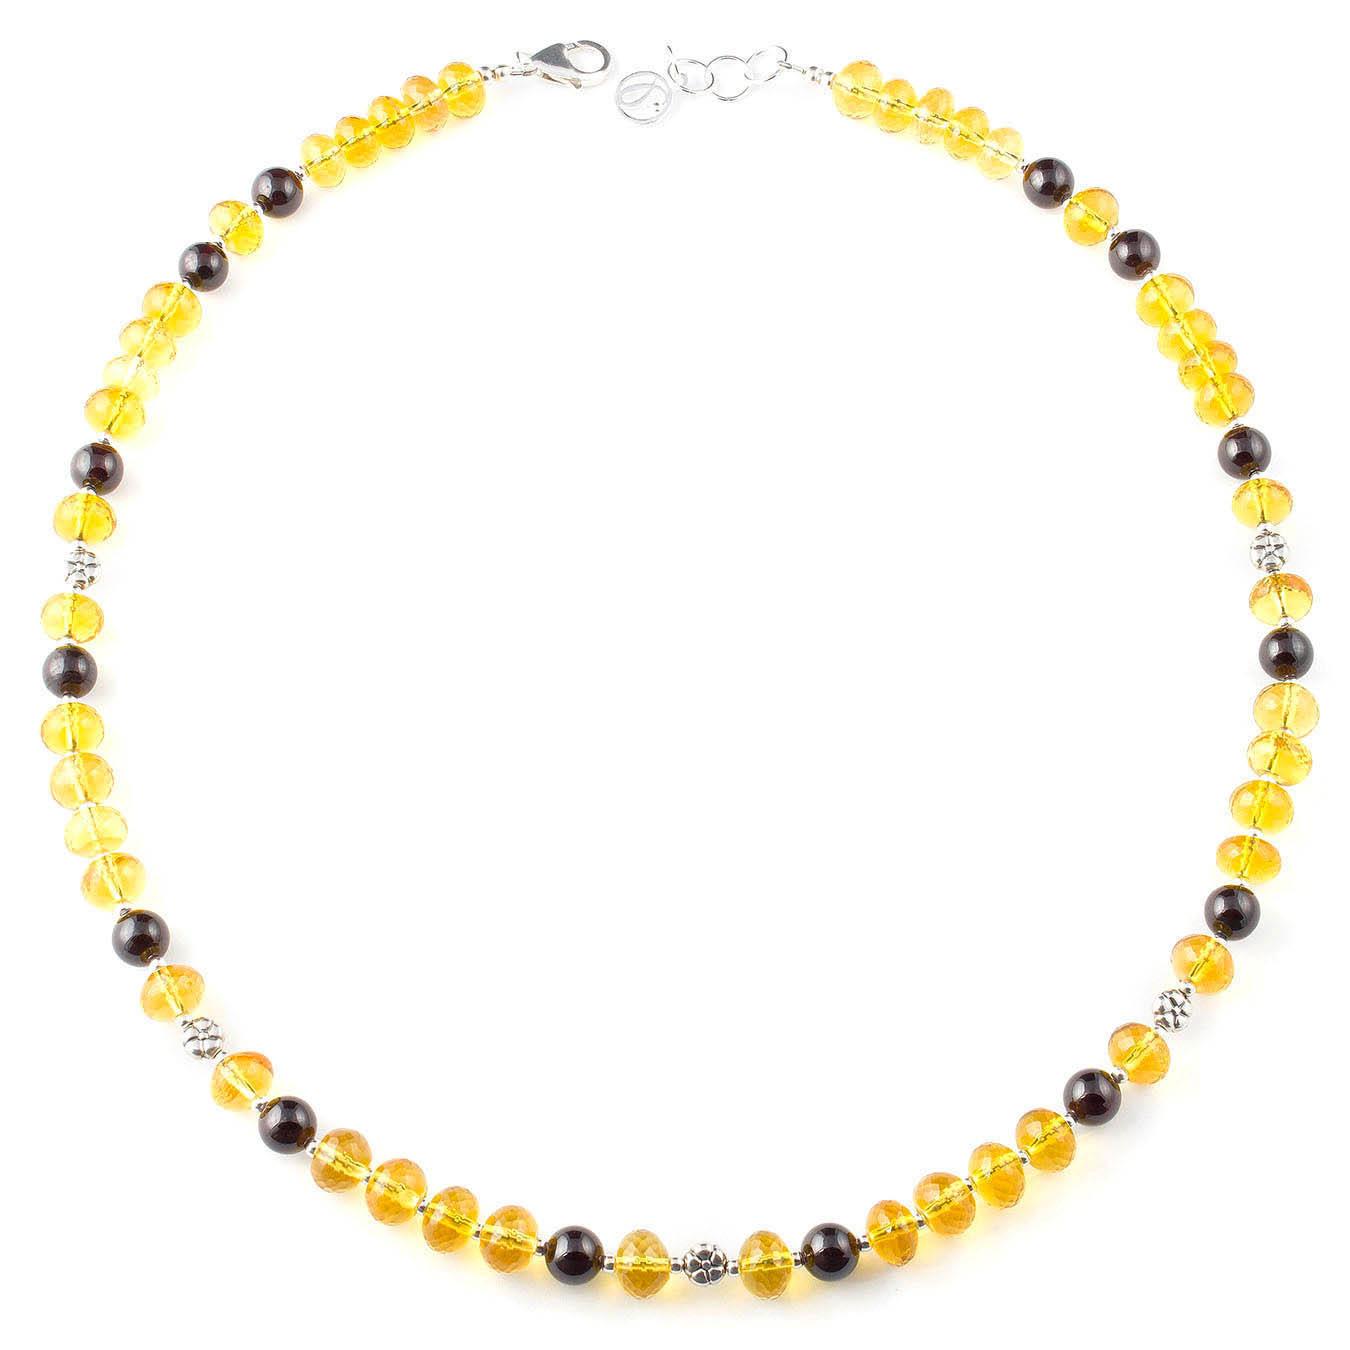 Handcrafted multi-gemstone citrine and garnet birthstone necklace